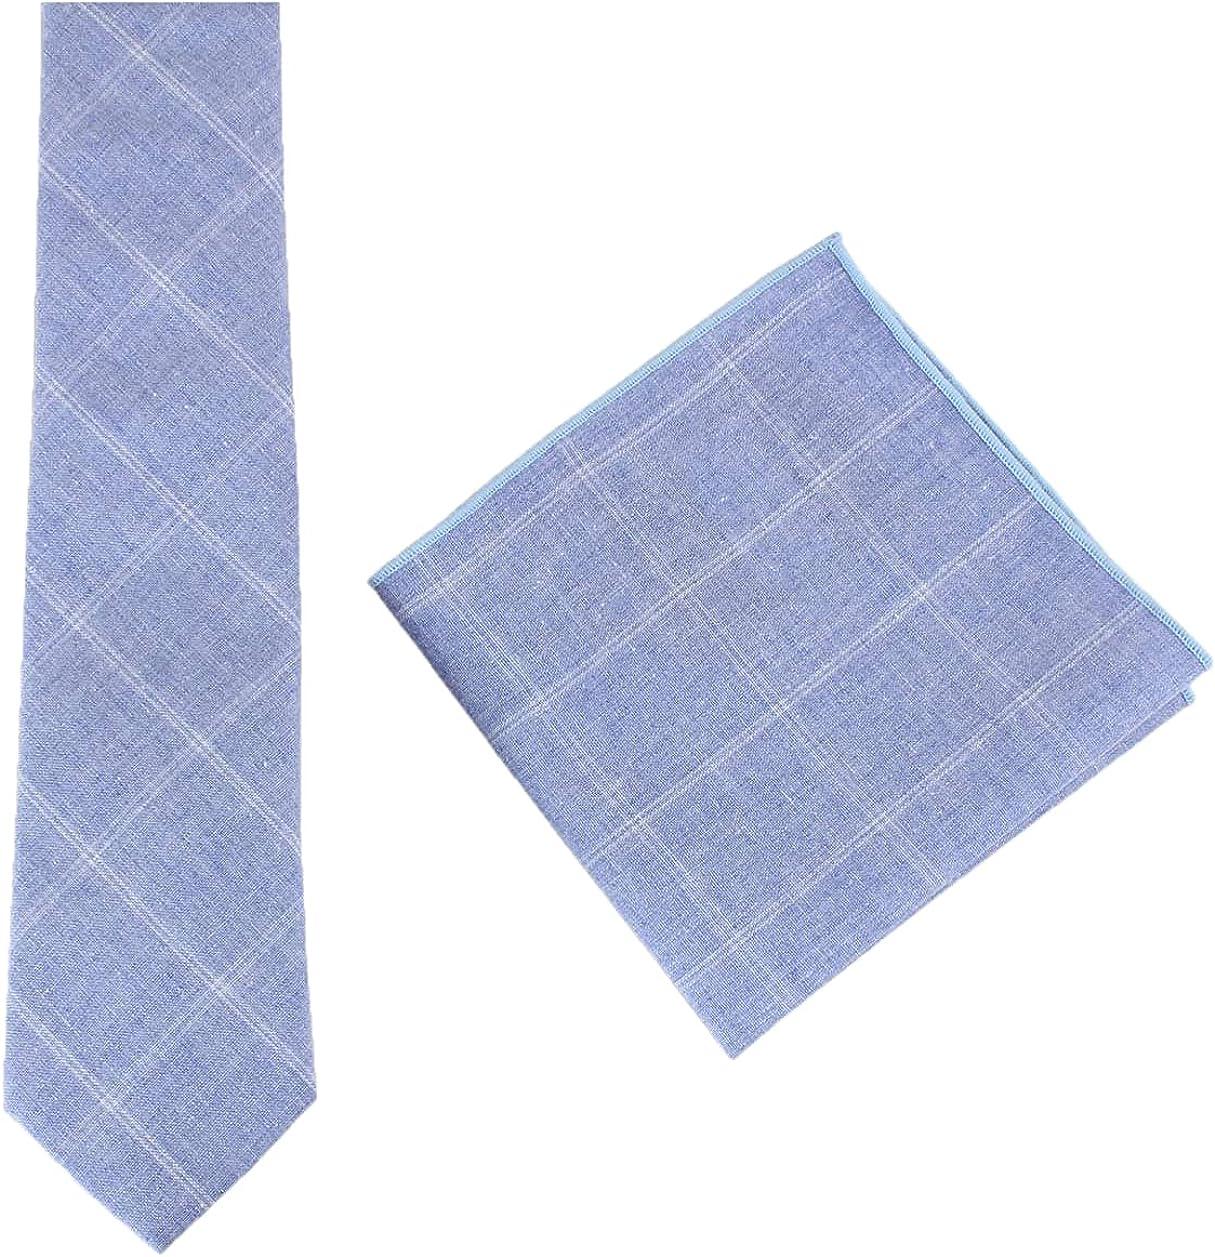 Knightsbridge Neckwear Mens Cotton Tie and Pocket Square Set - Light Blue